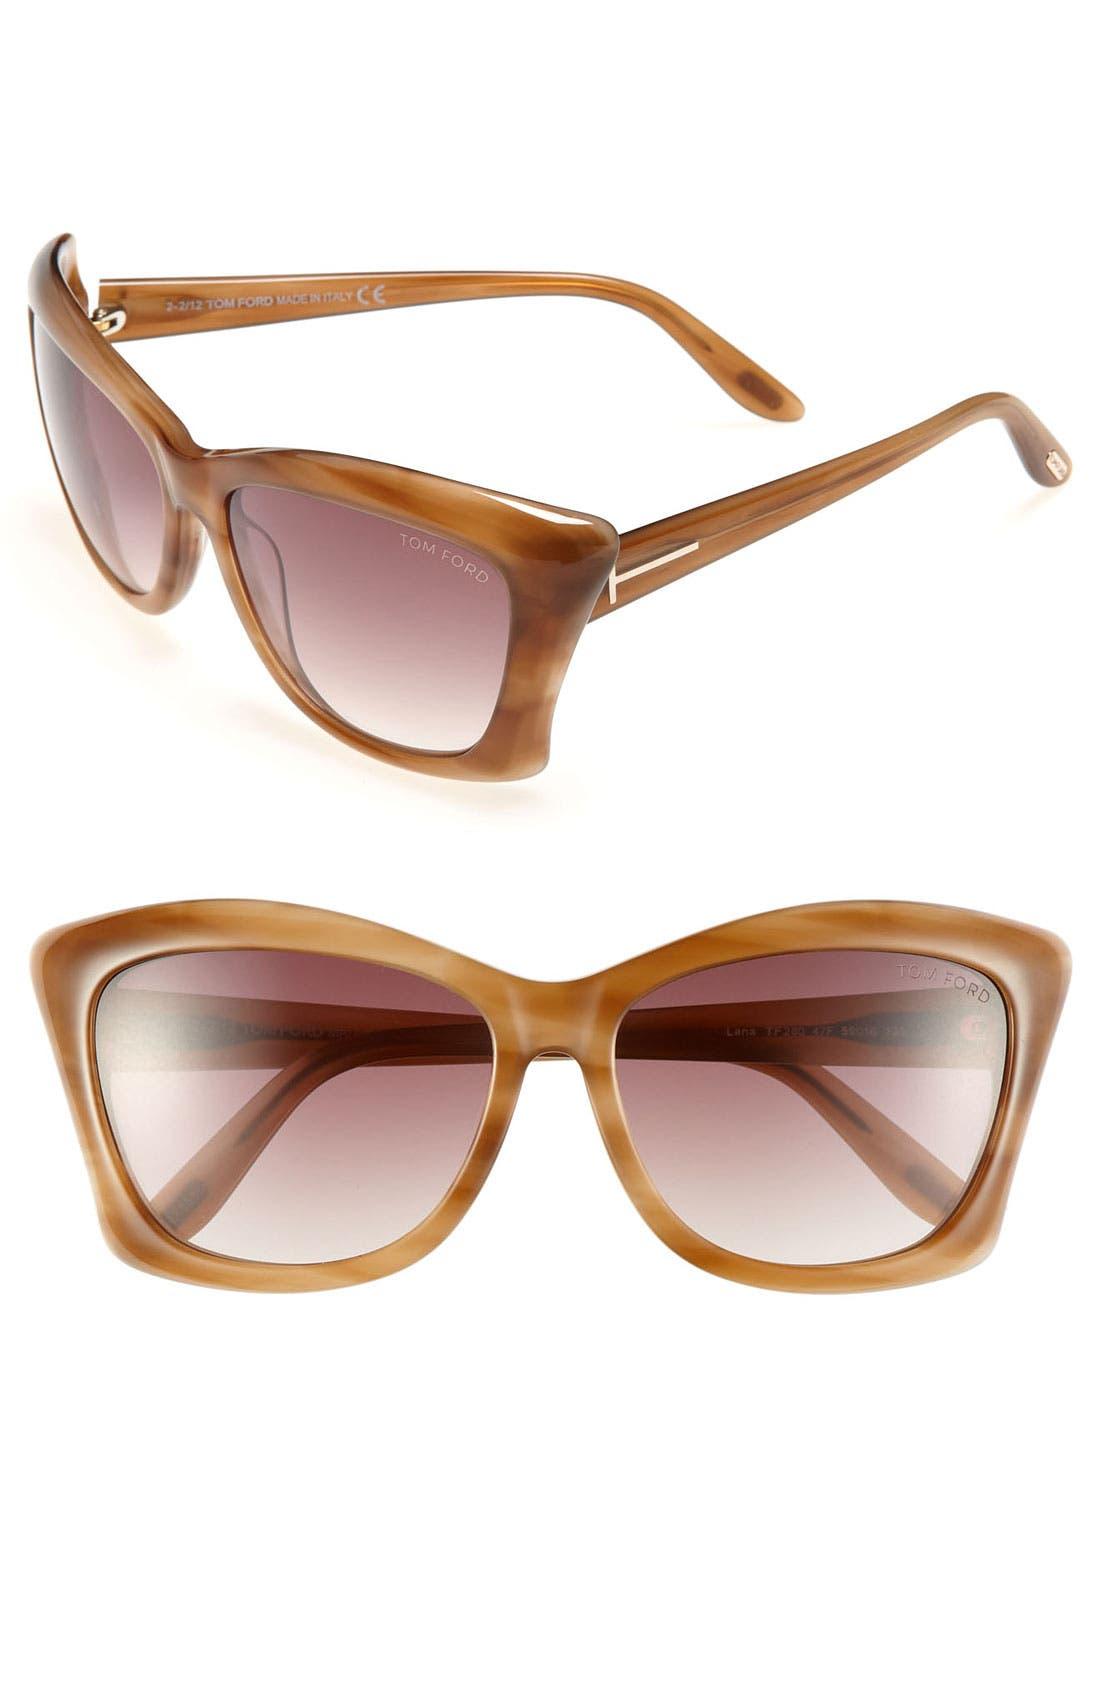 Main Image - Tom Ford 'Lana' 59mm Sunglasses